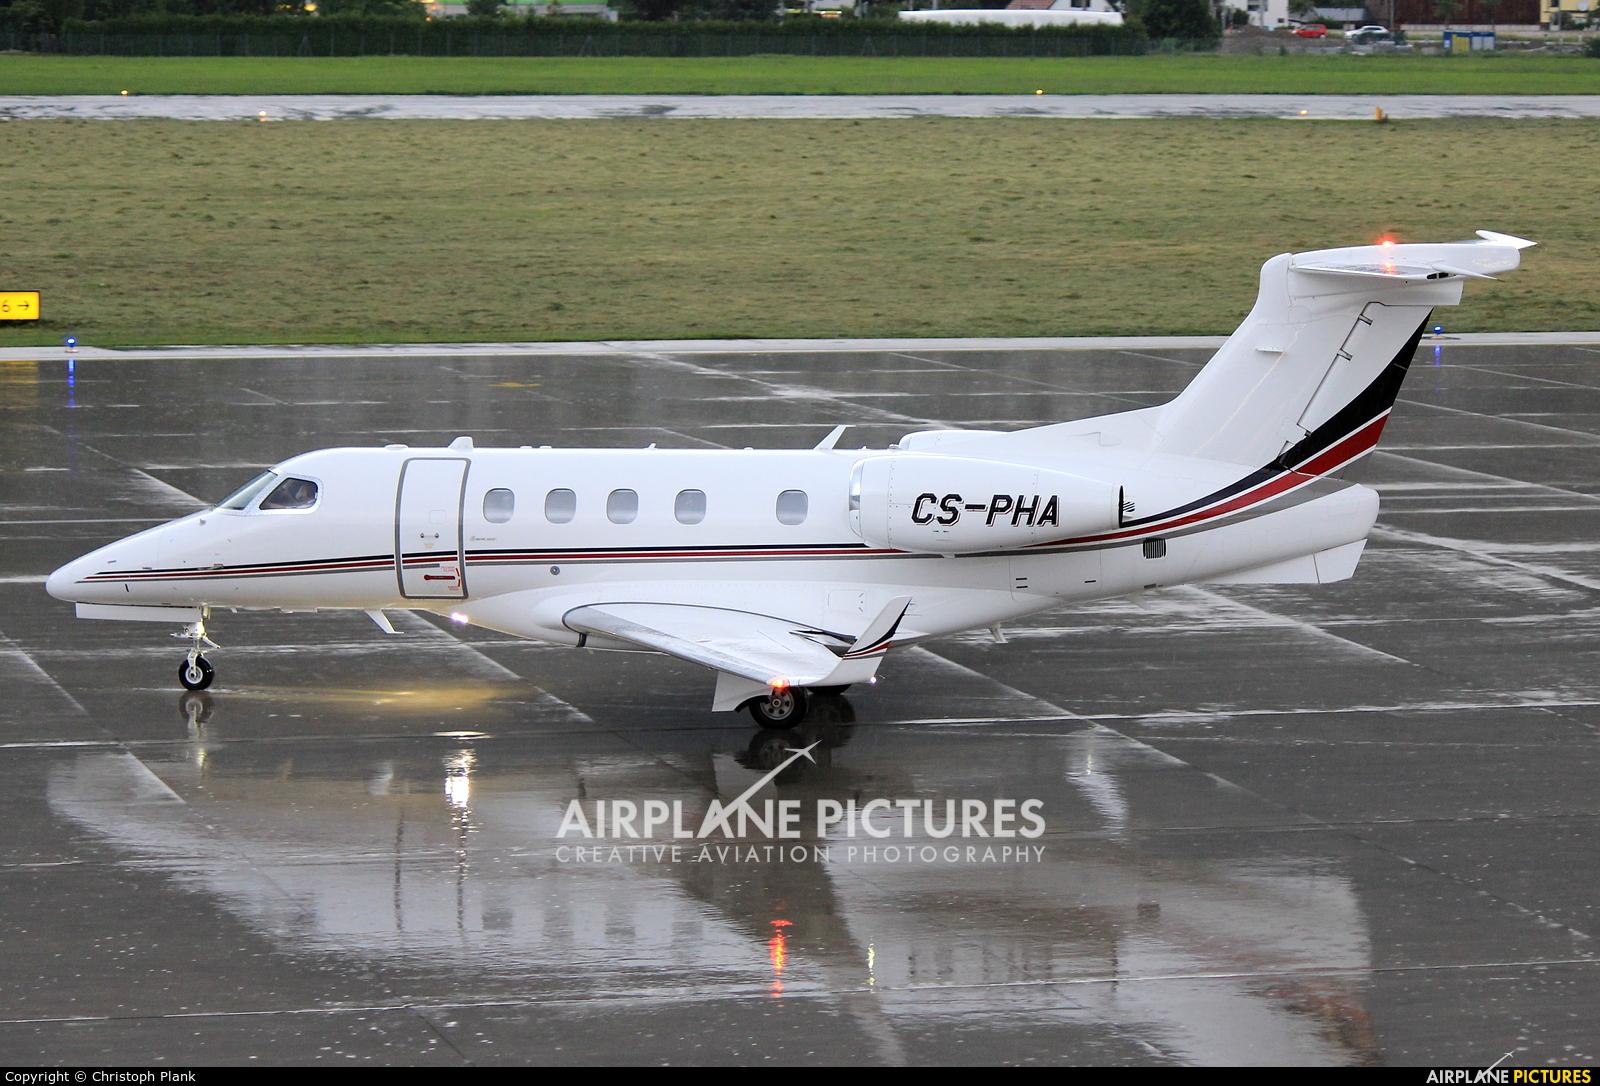 NetJets Europe (Portugal) CS-PHA aircraft at Innsbruck